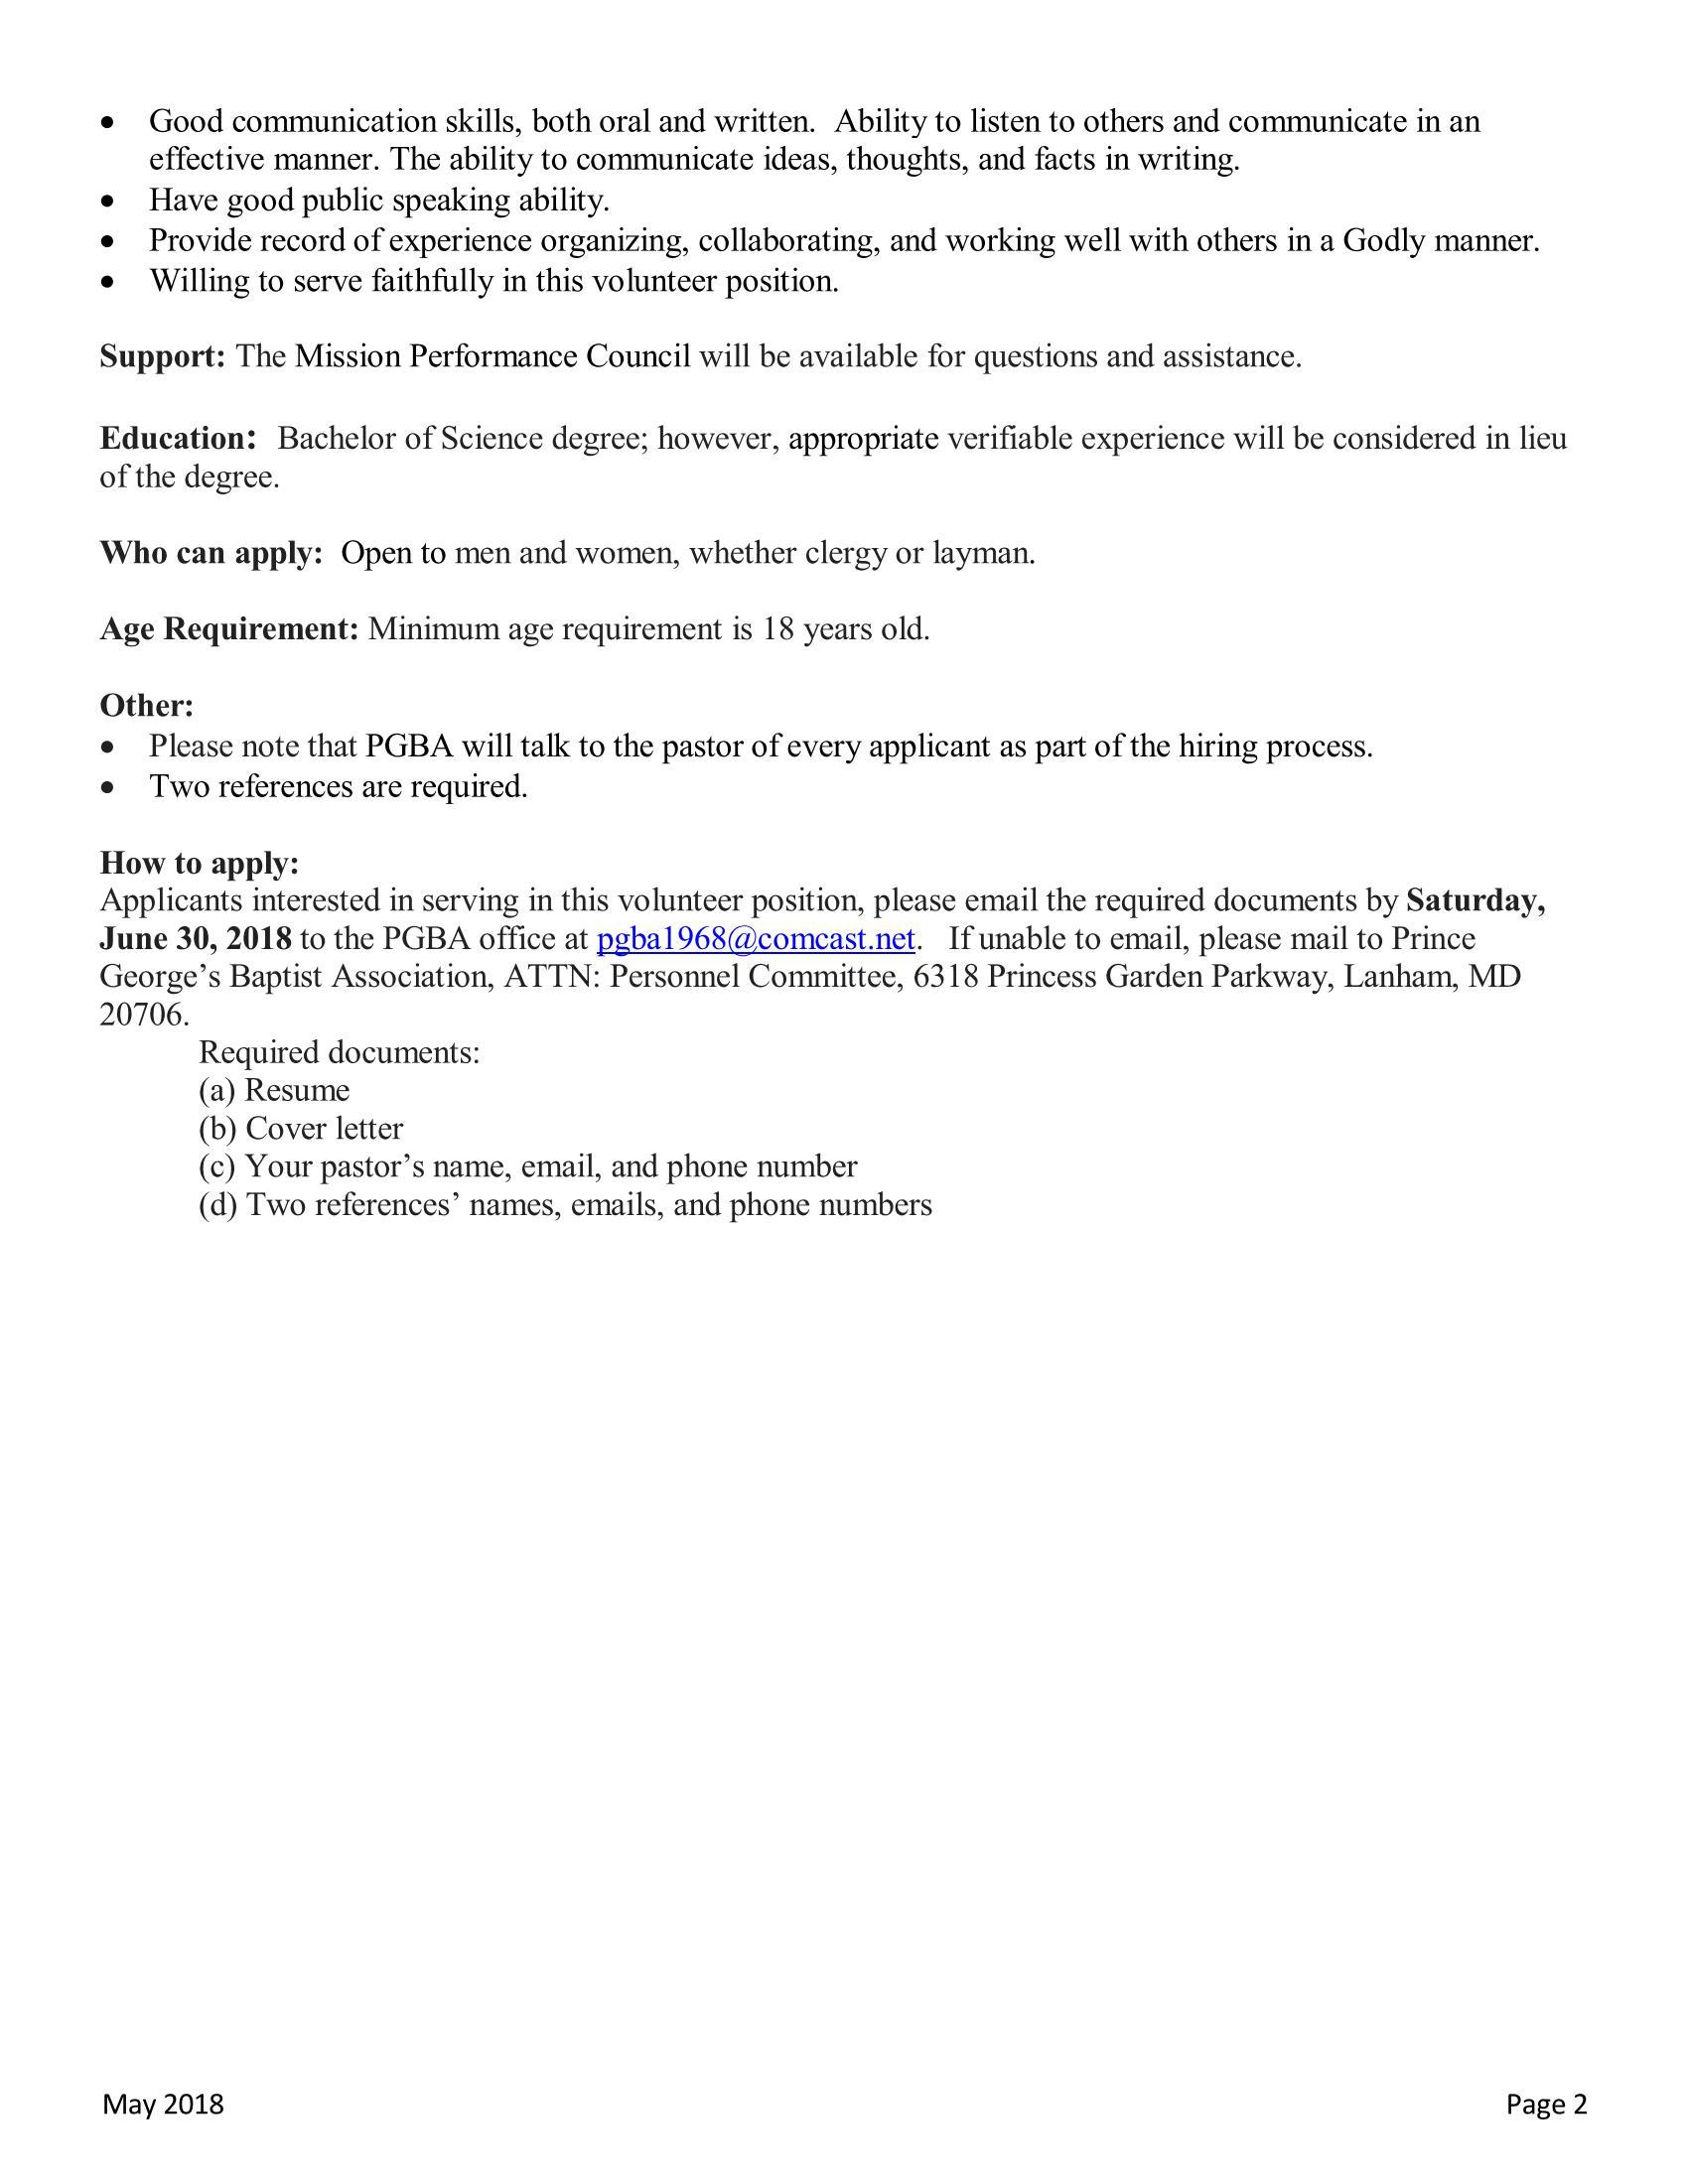 ... Job Description Director Of Ministry 2018 Pub_page_2